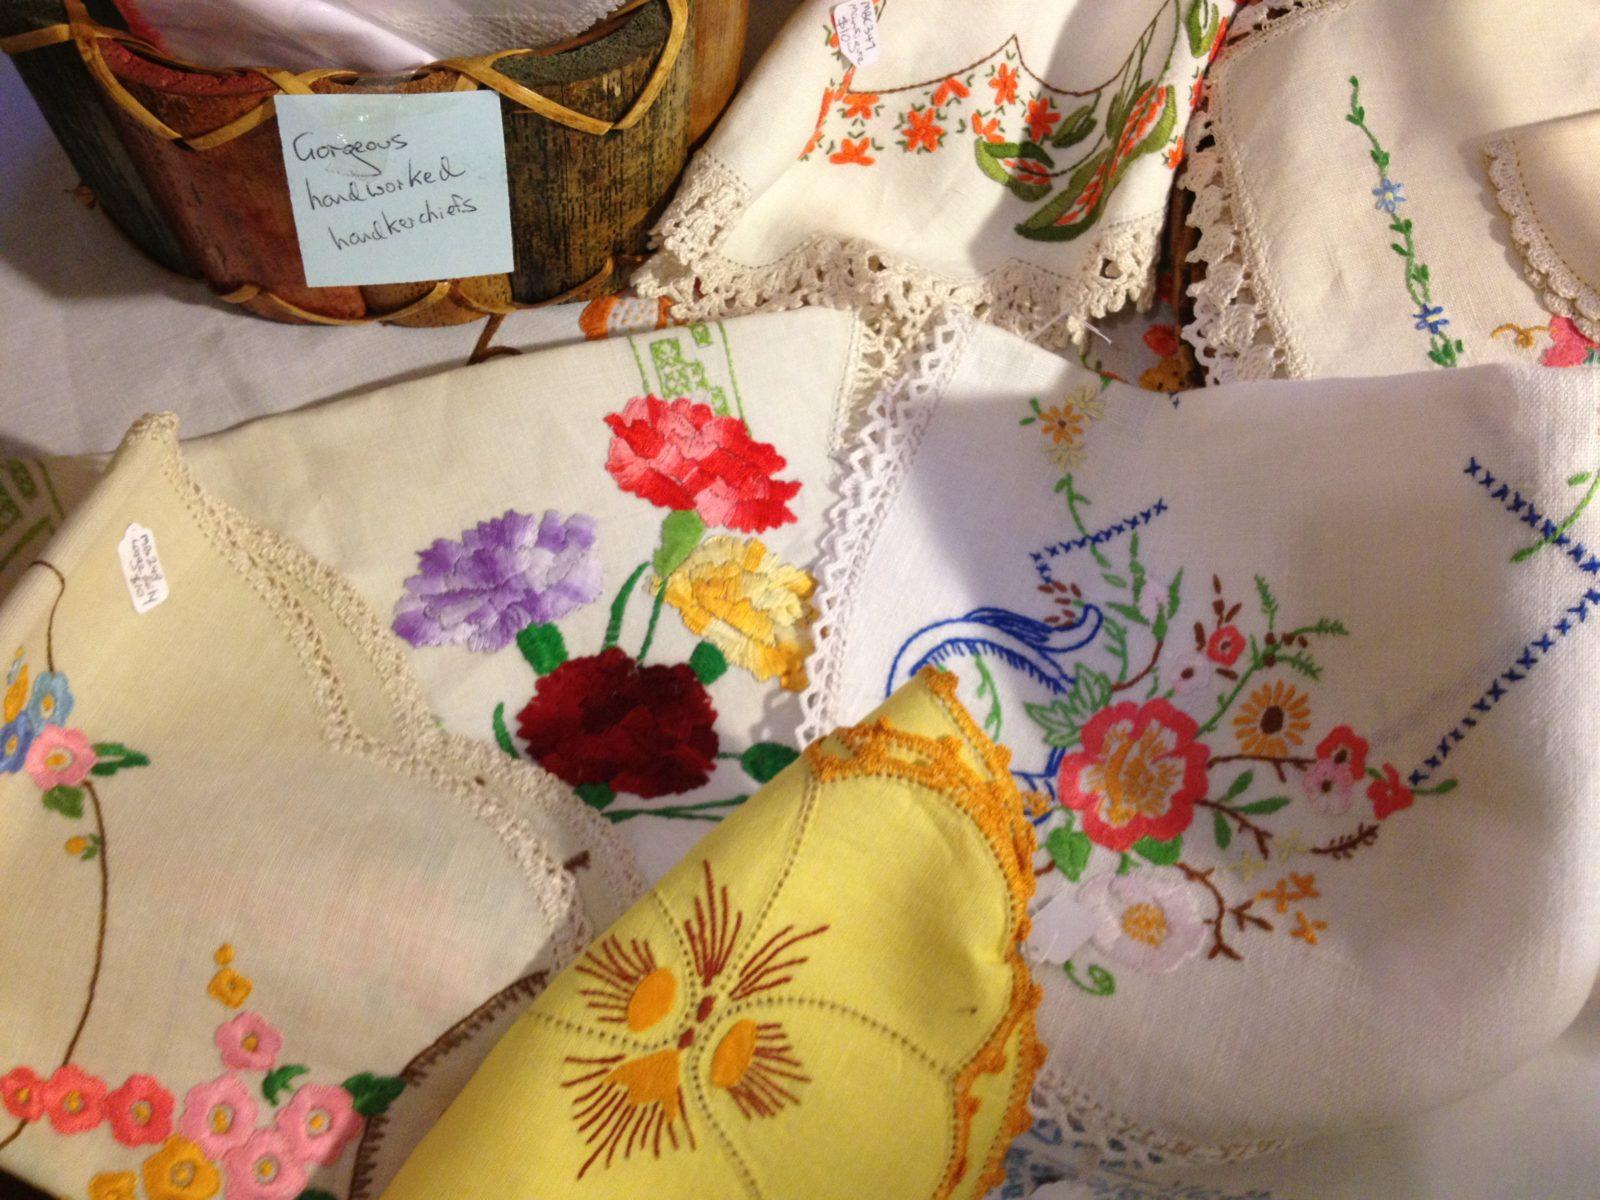 Vintage embroideries